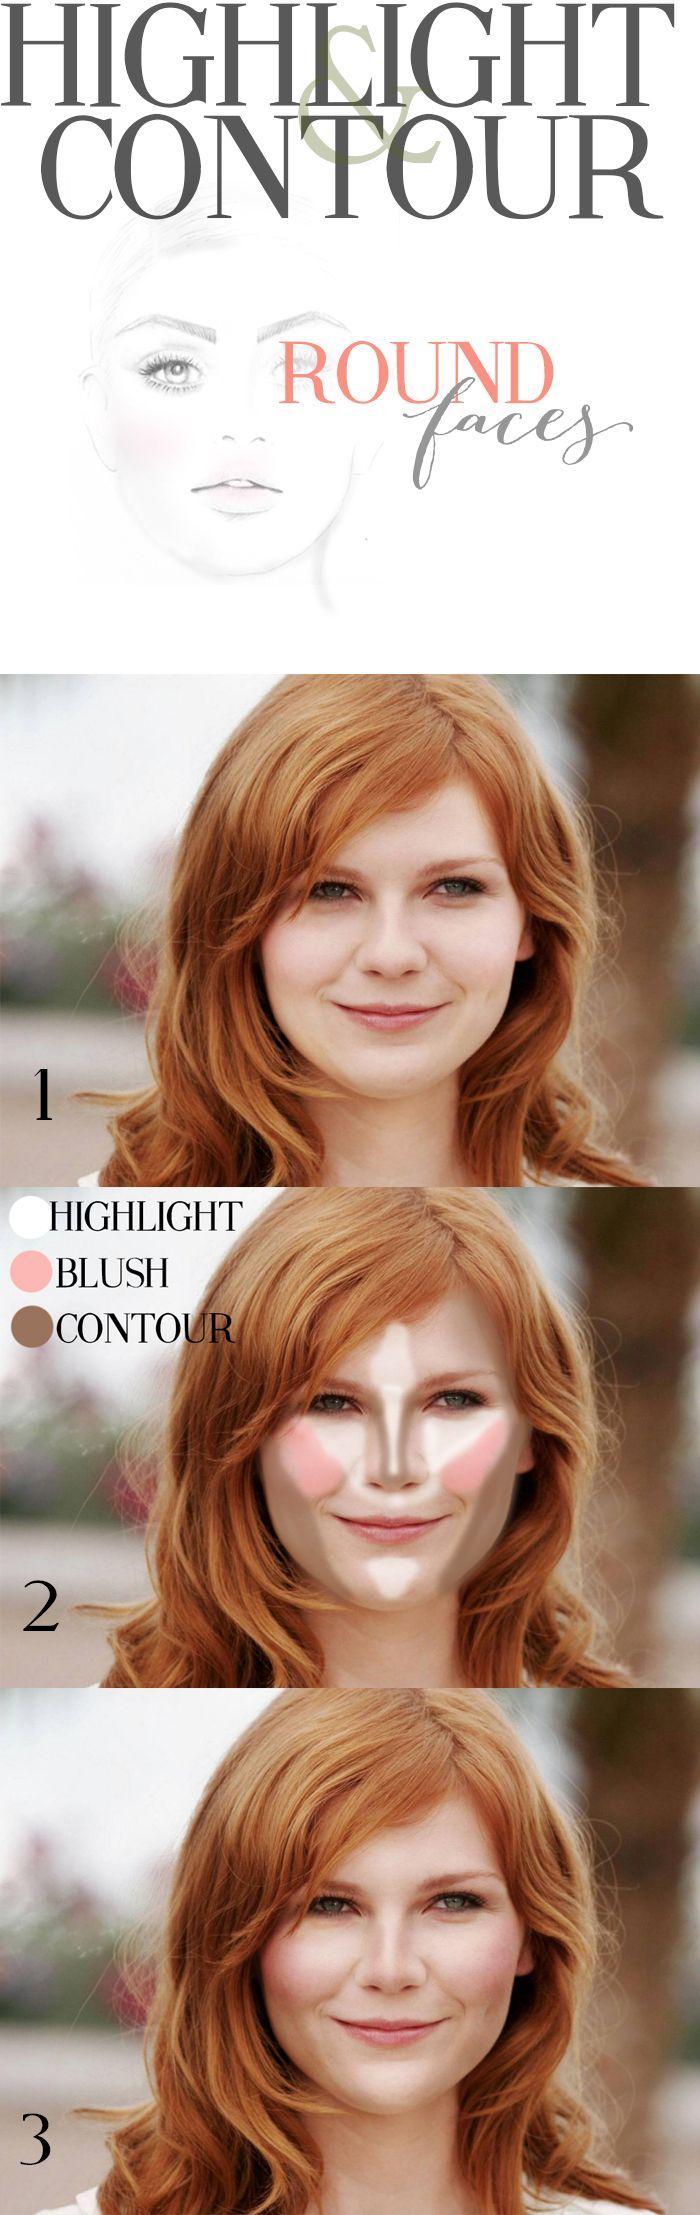 Face shape-round highlighting and contouring @Cara K K K K K Ferrier